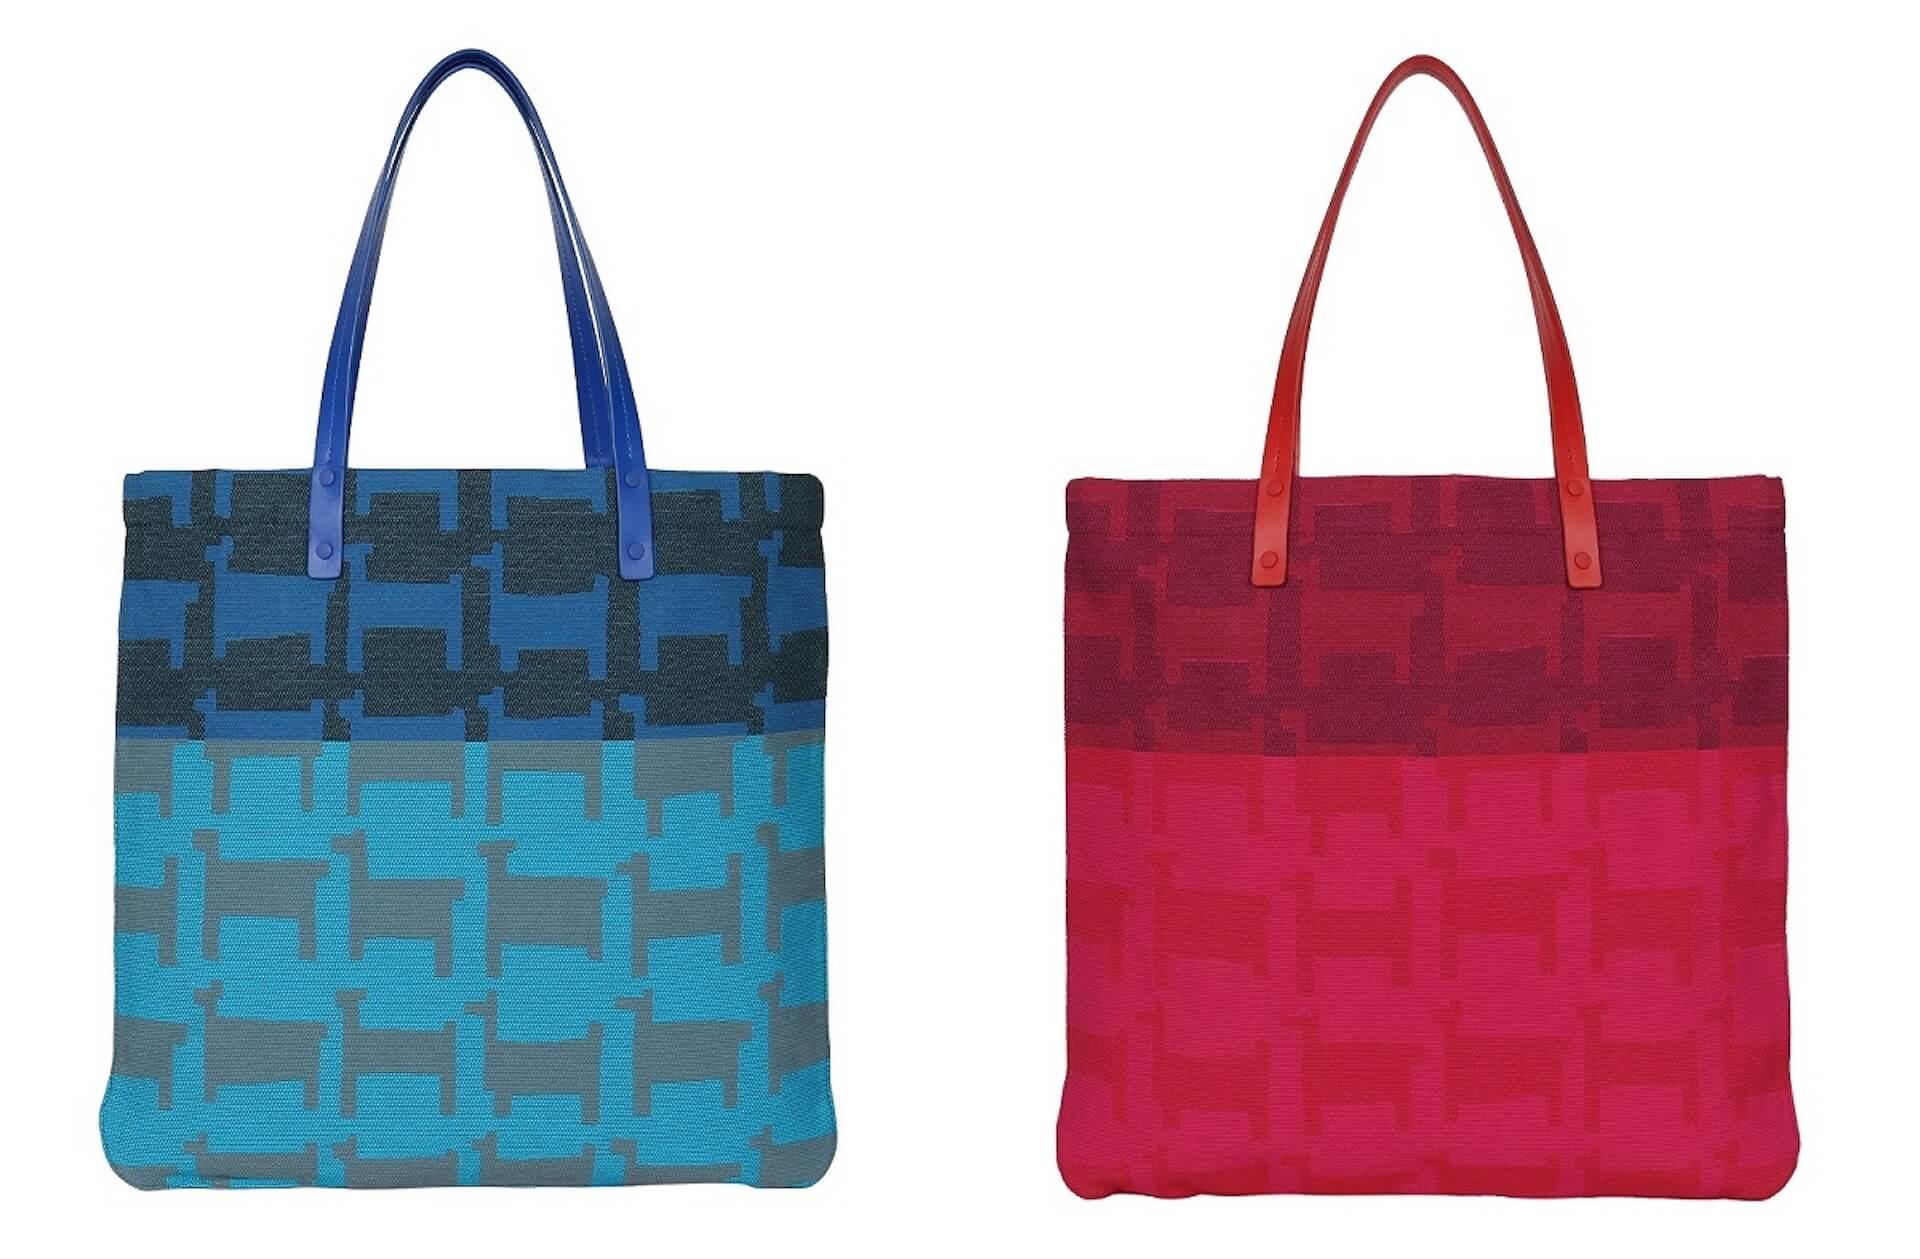 CAMPERと鈴木マサルが3度目のコラボコレクションを発表!RUNNERをベースにしたシューズや新作バッグなどが登場 fashion210118_camper_suzukimasaru_7